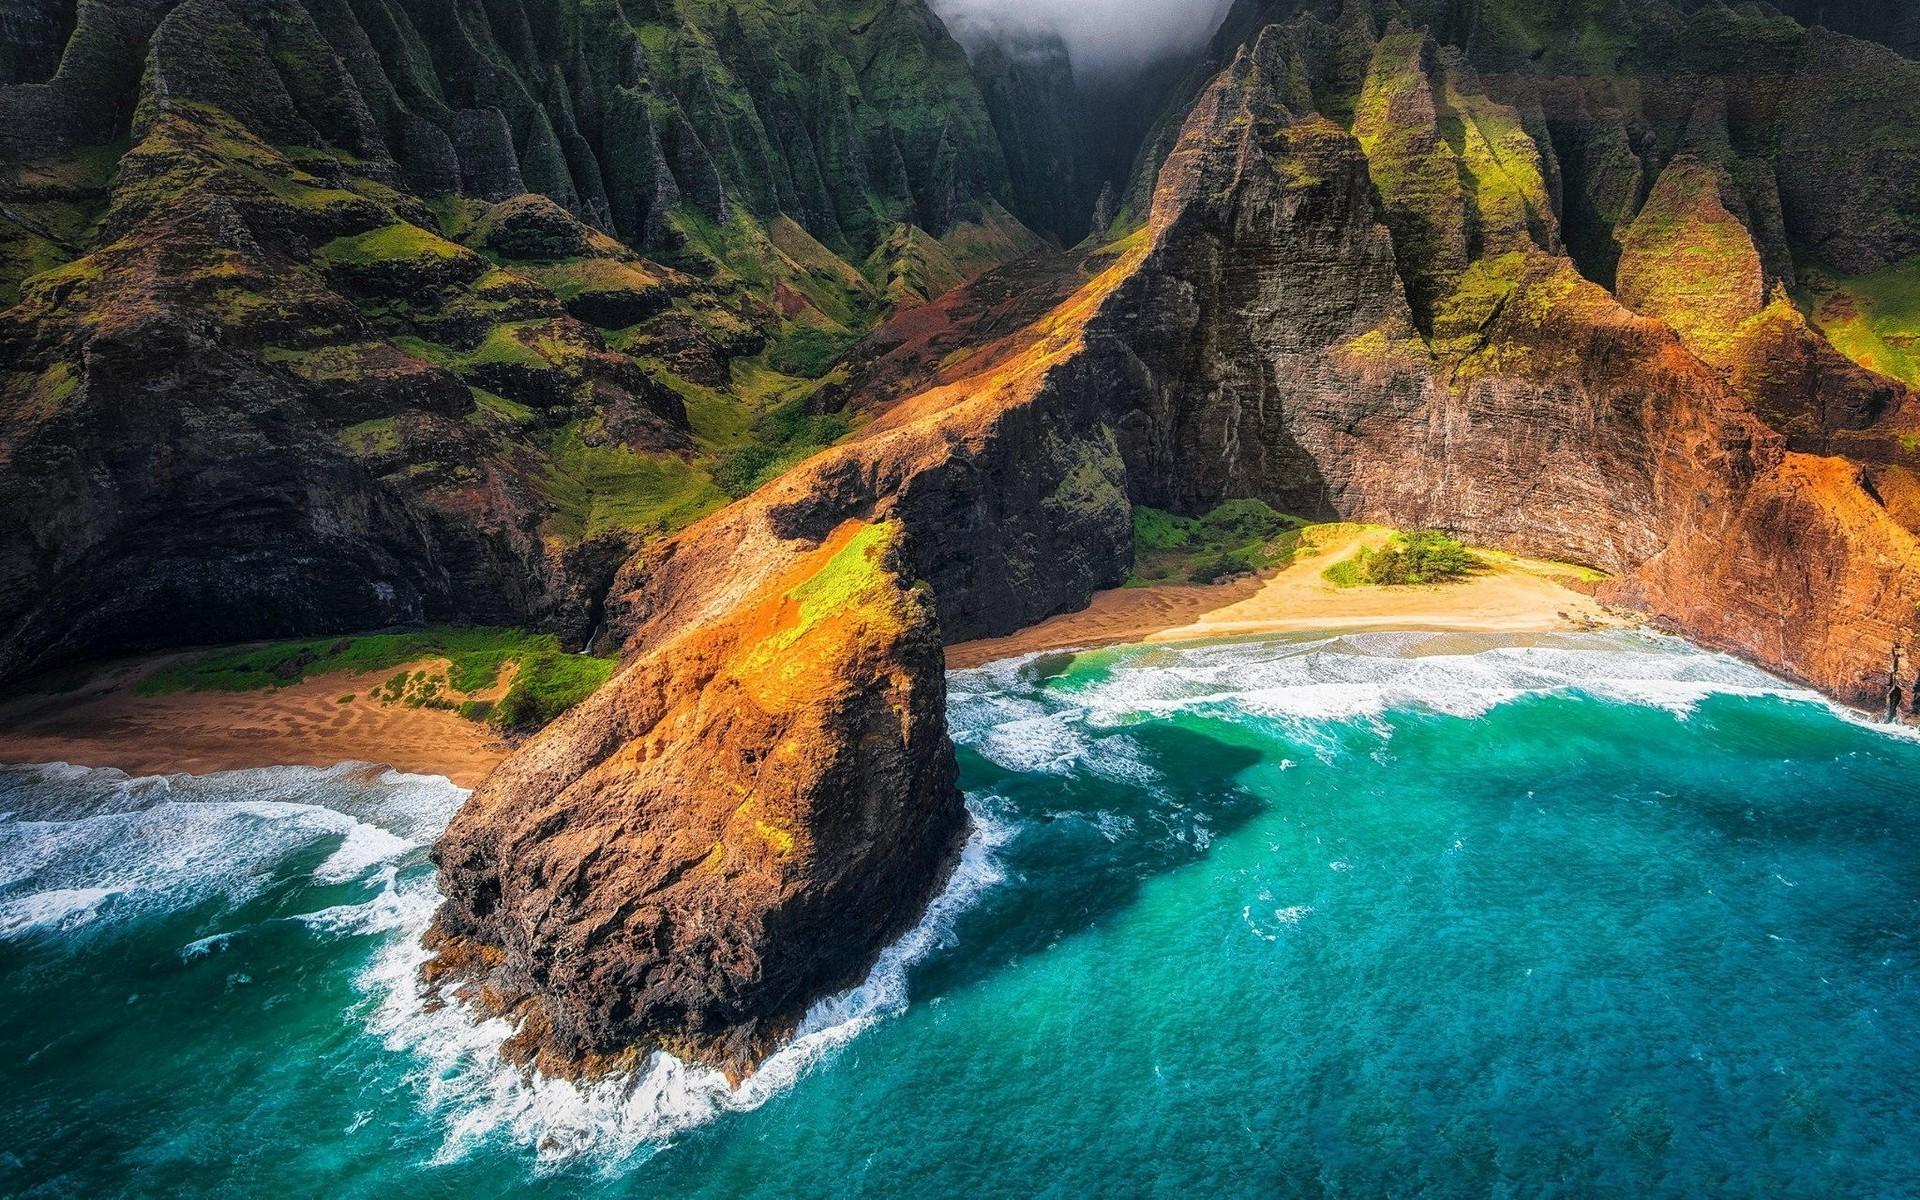 Kauai Wallpapers 54 images 1920x1200